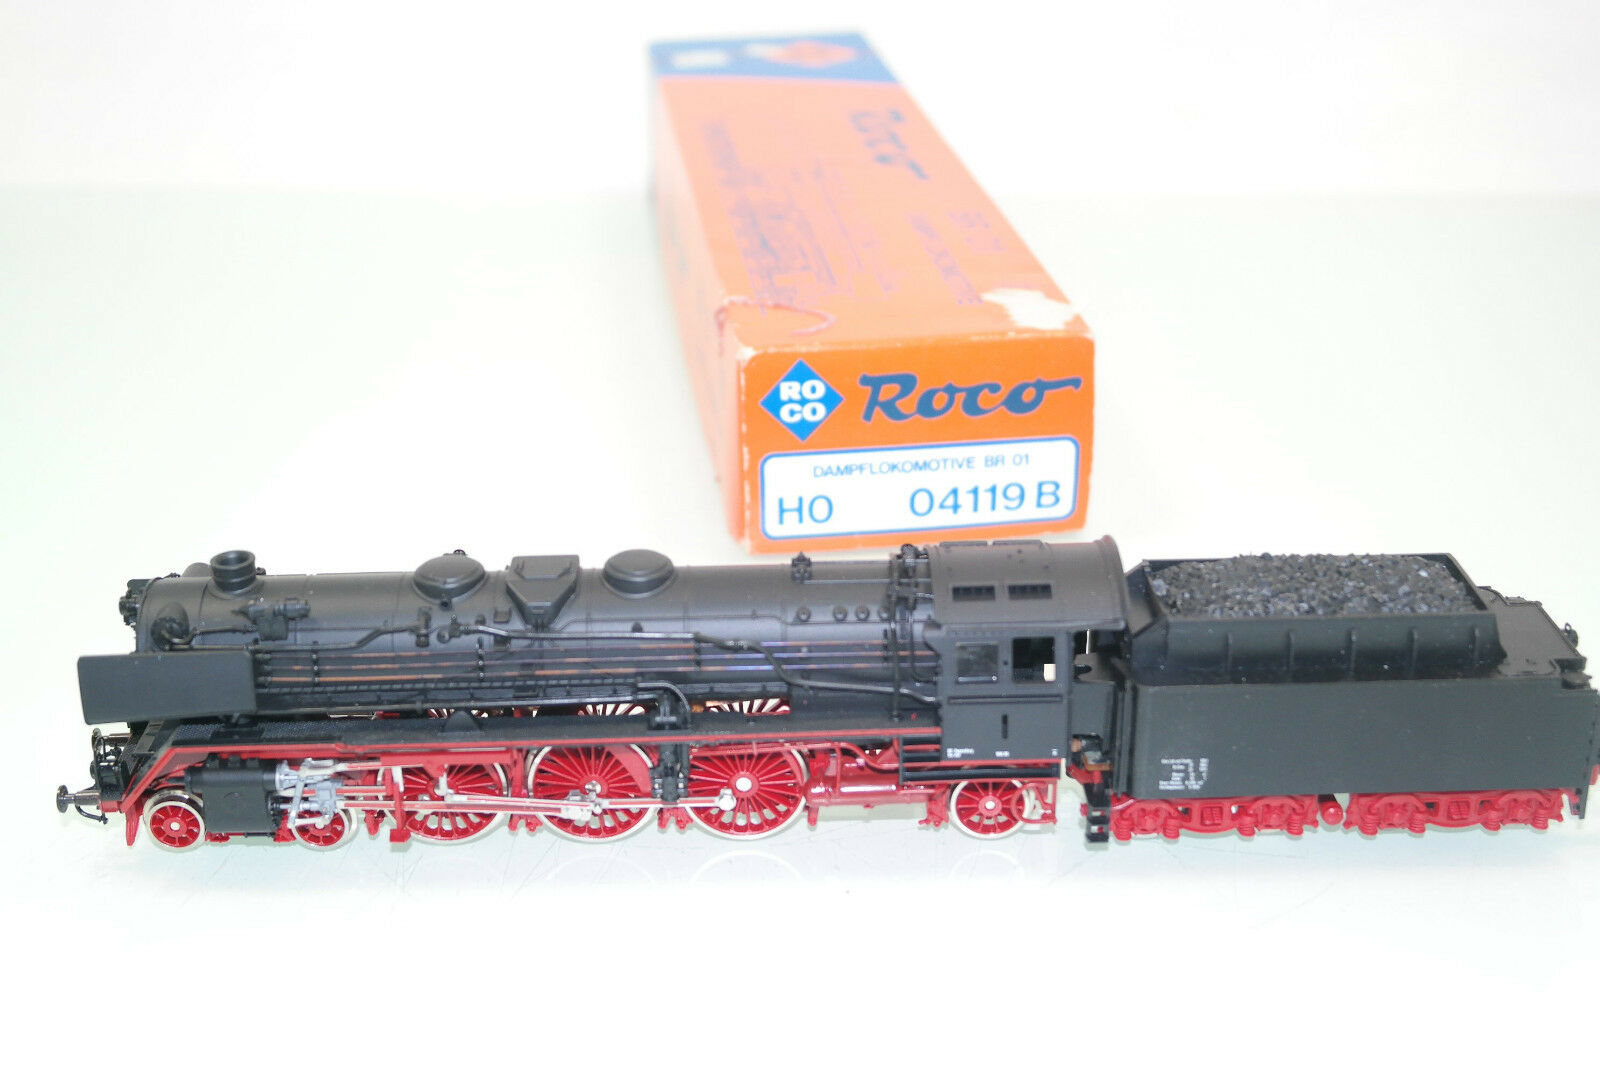 Roco h0 4119b Steam-Lok br 01 de la DB (jm607) OVP